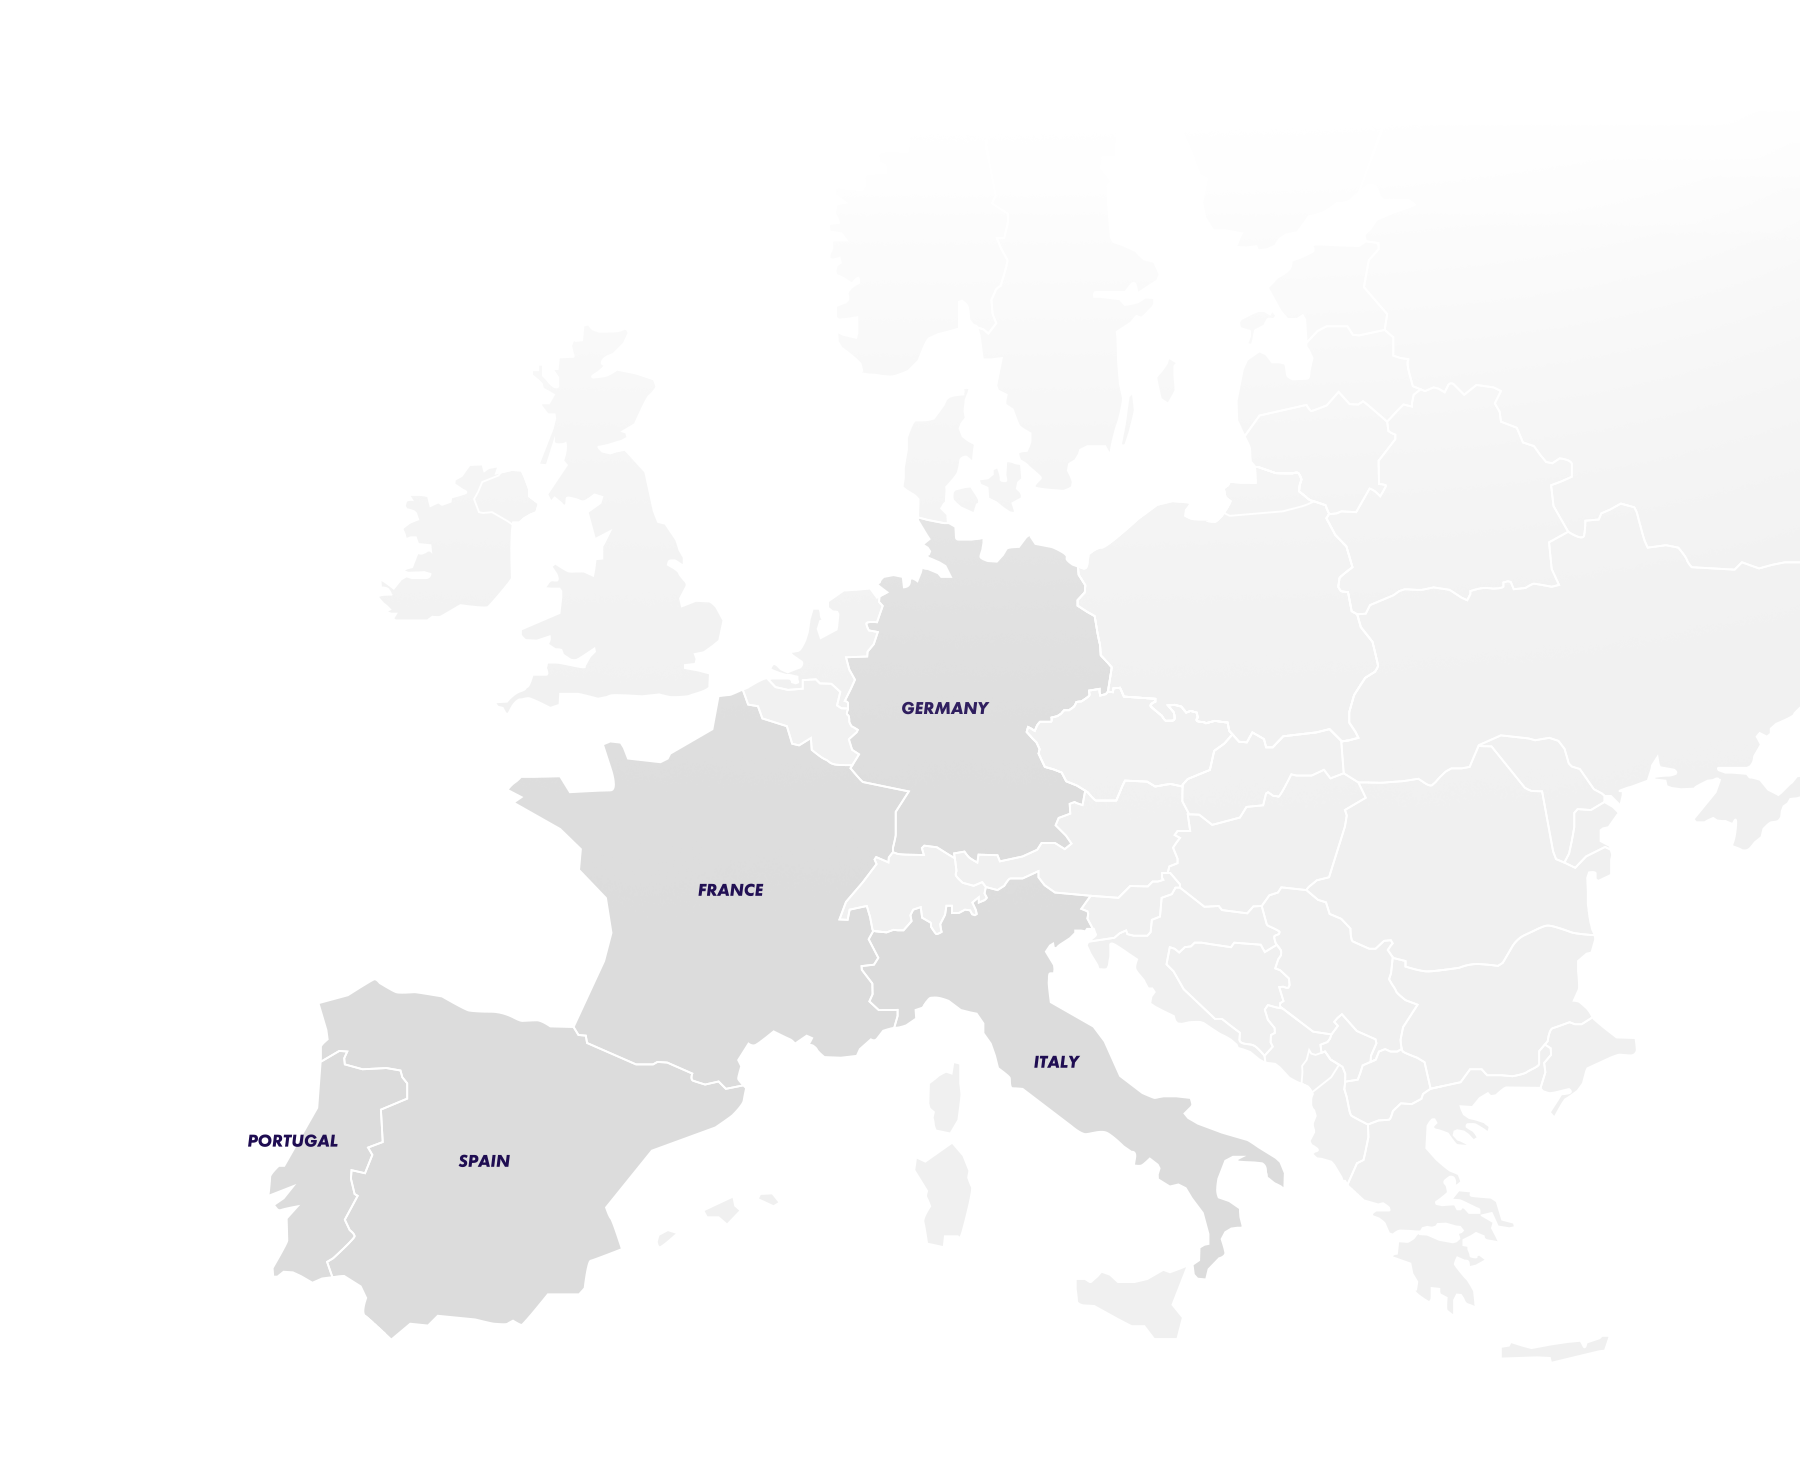 SPR - 48 facilities in Europe